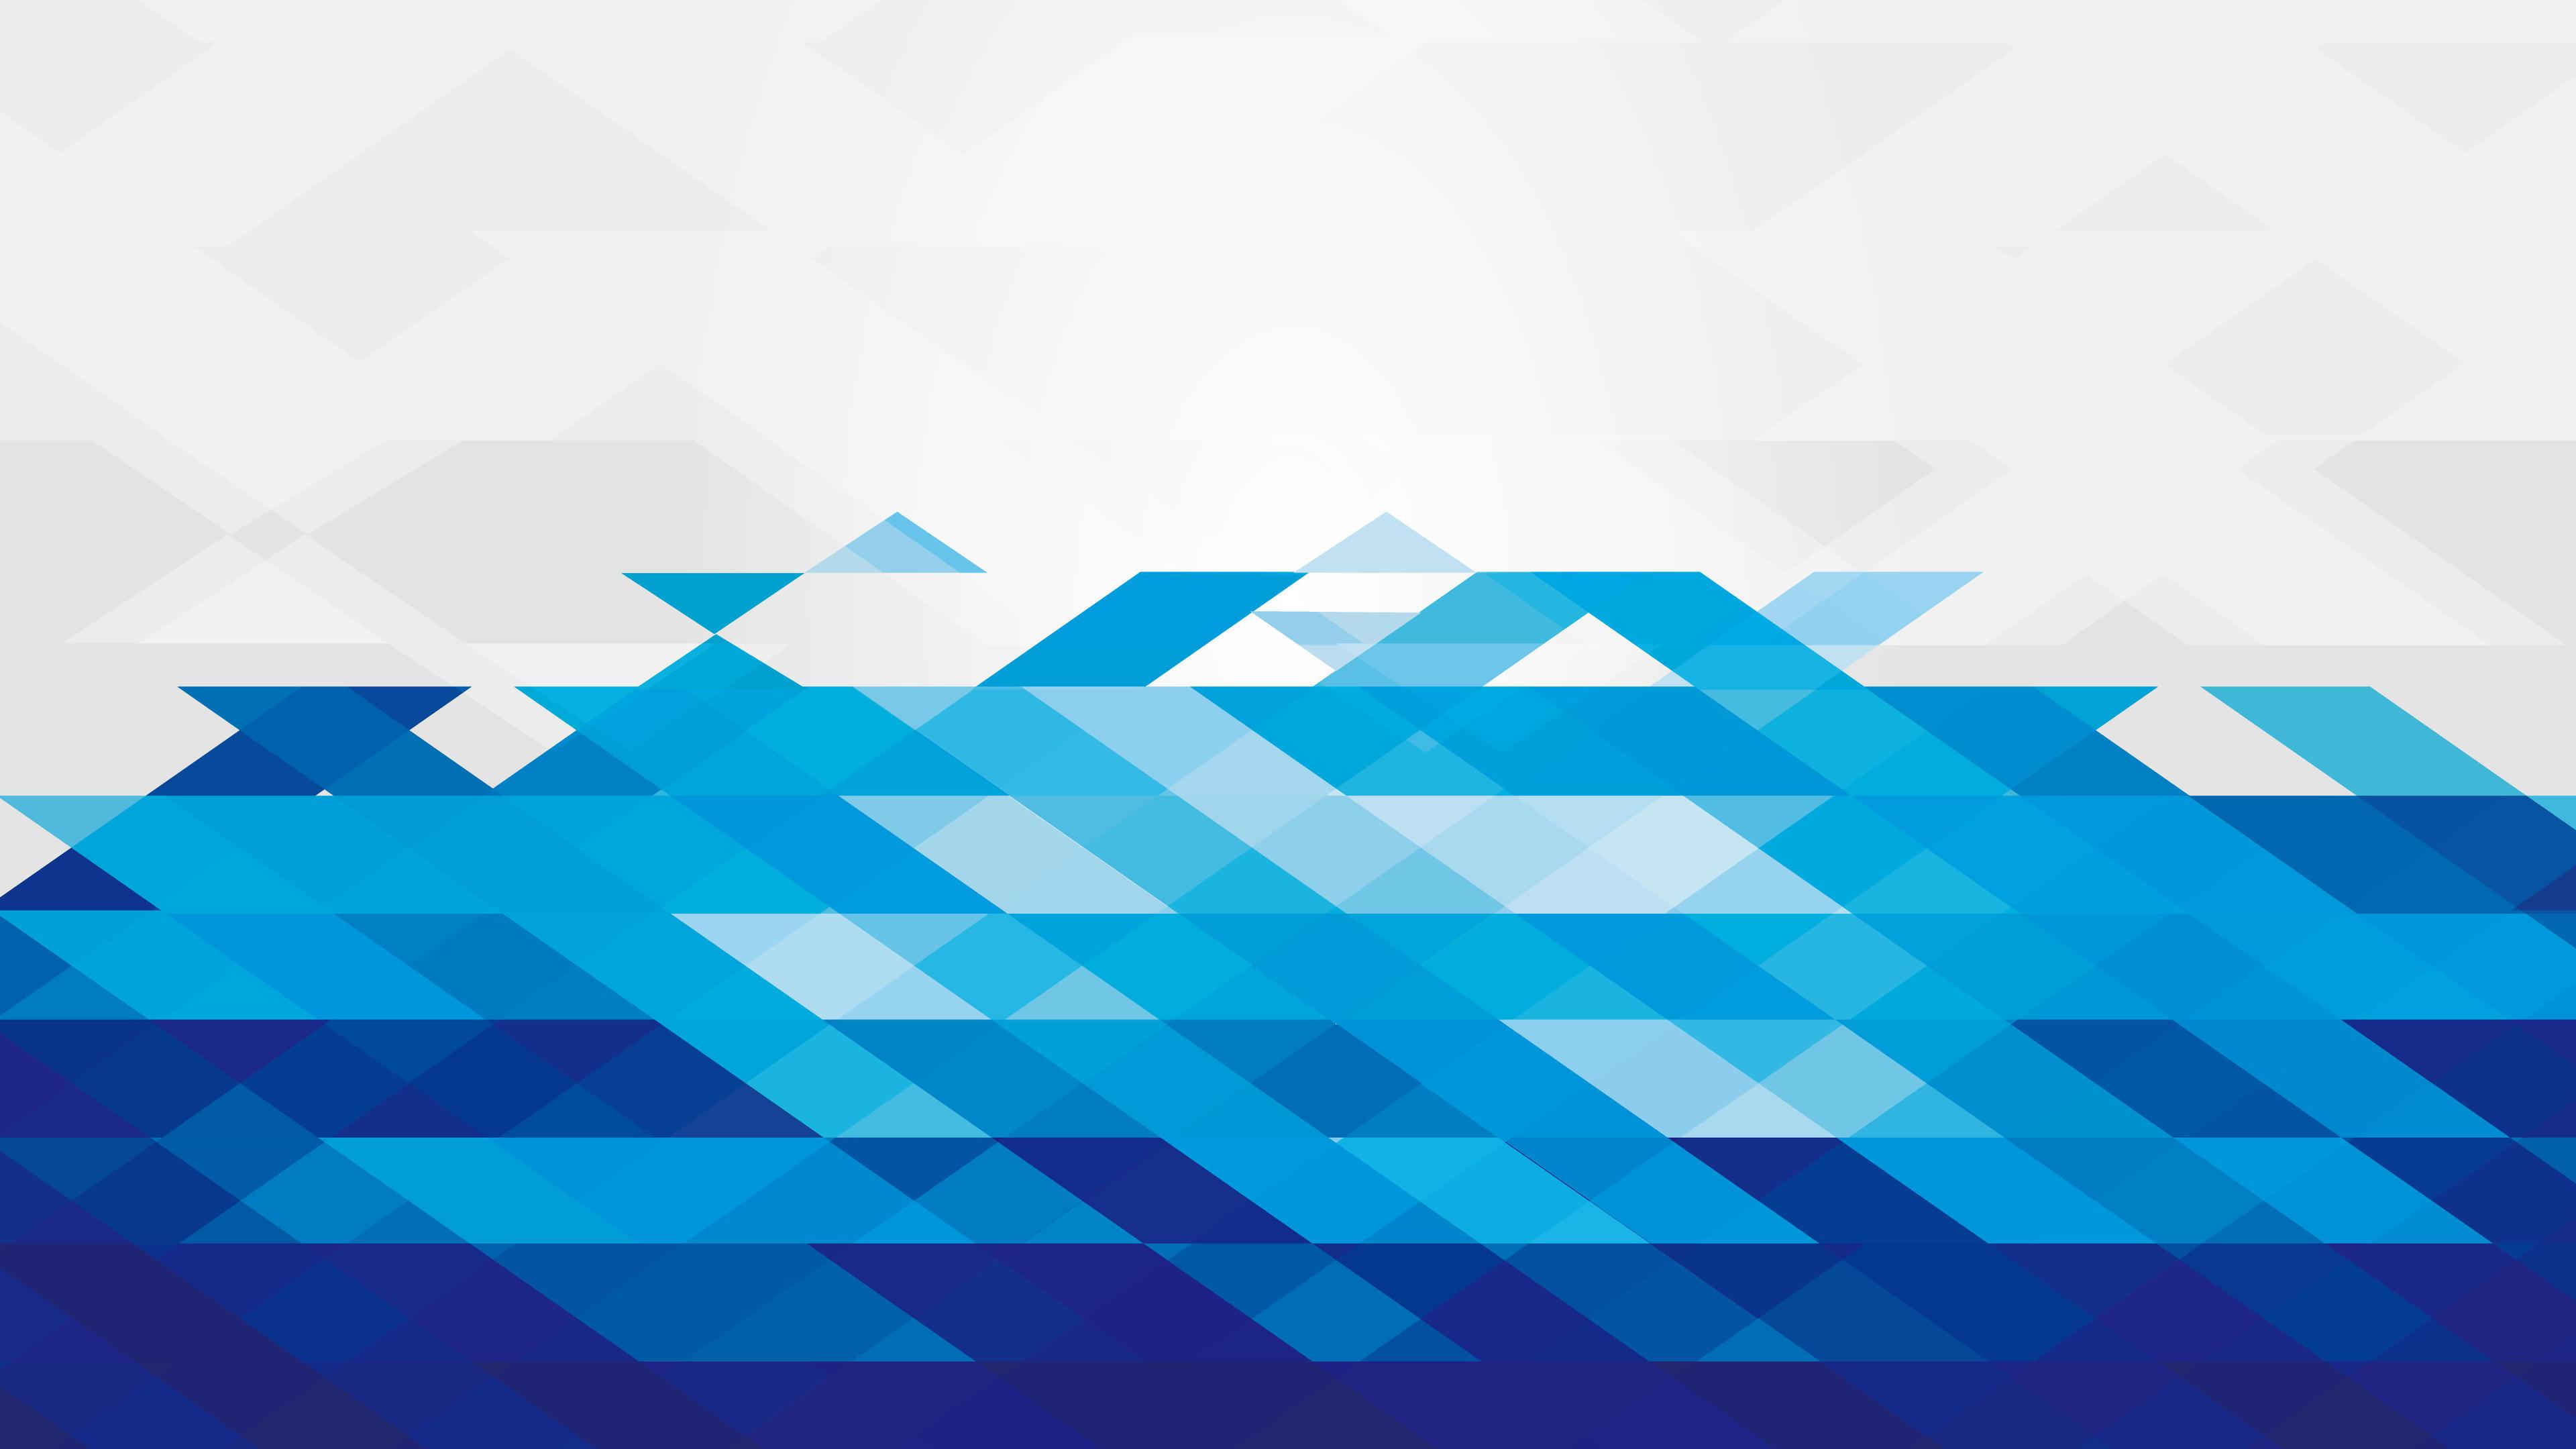 blue white pattern abstract 4k 5k 1539370844 - Blue White Pattern Abstract 4k 5k - hd-wallpapers, abstract wallpapers, 5k wallpapers, 4k-wallpapers